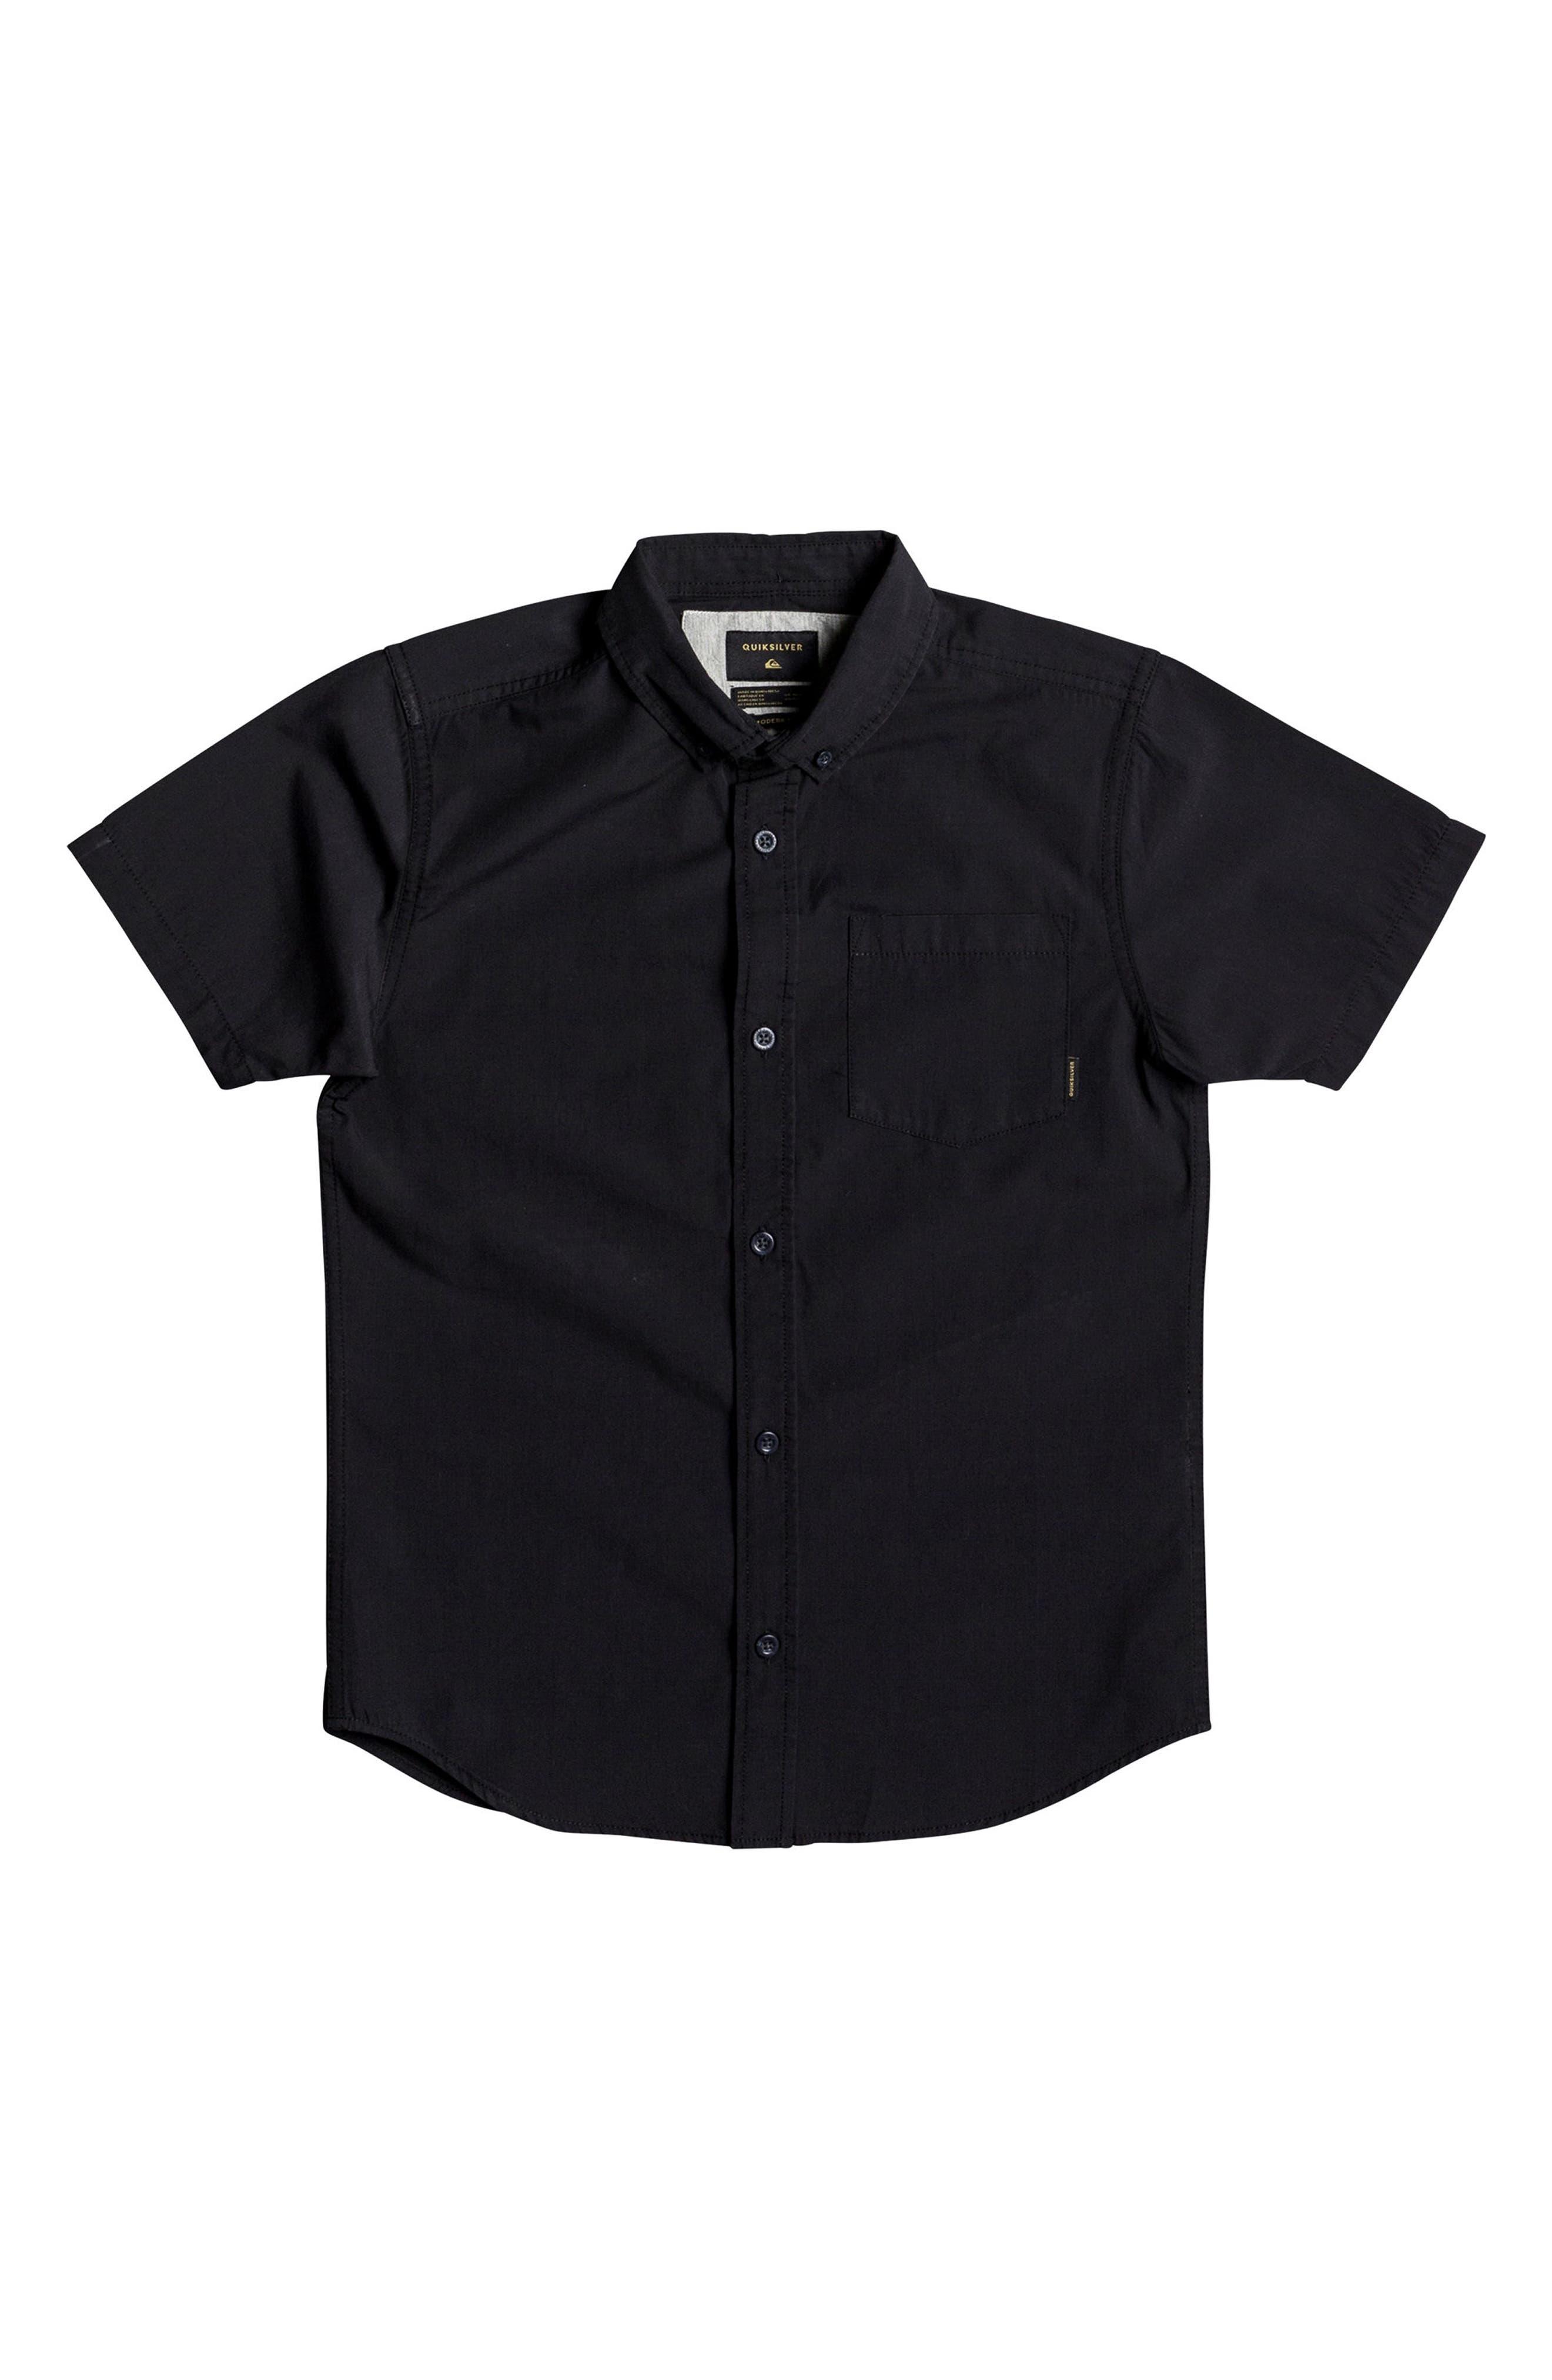 Main Image - Quiksilver Short Sleeve Button Down Shirt (Big Boys)